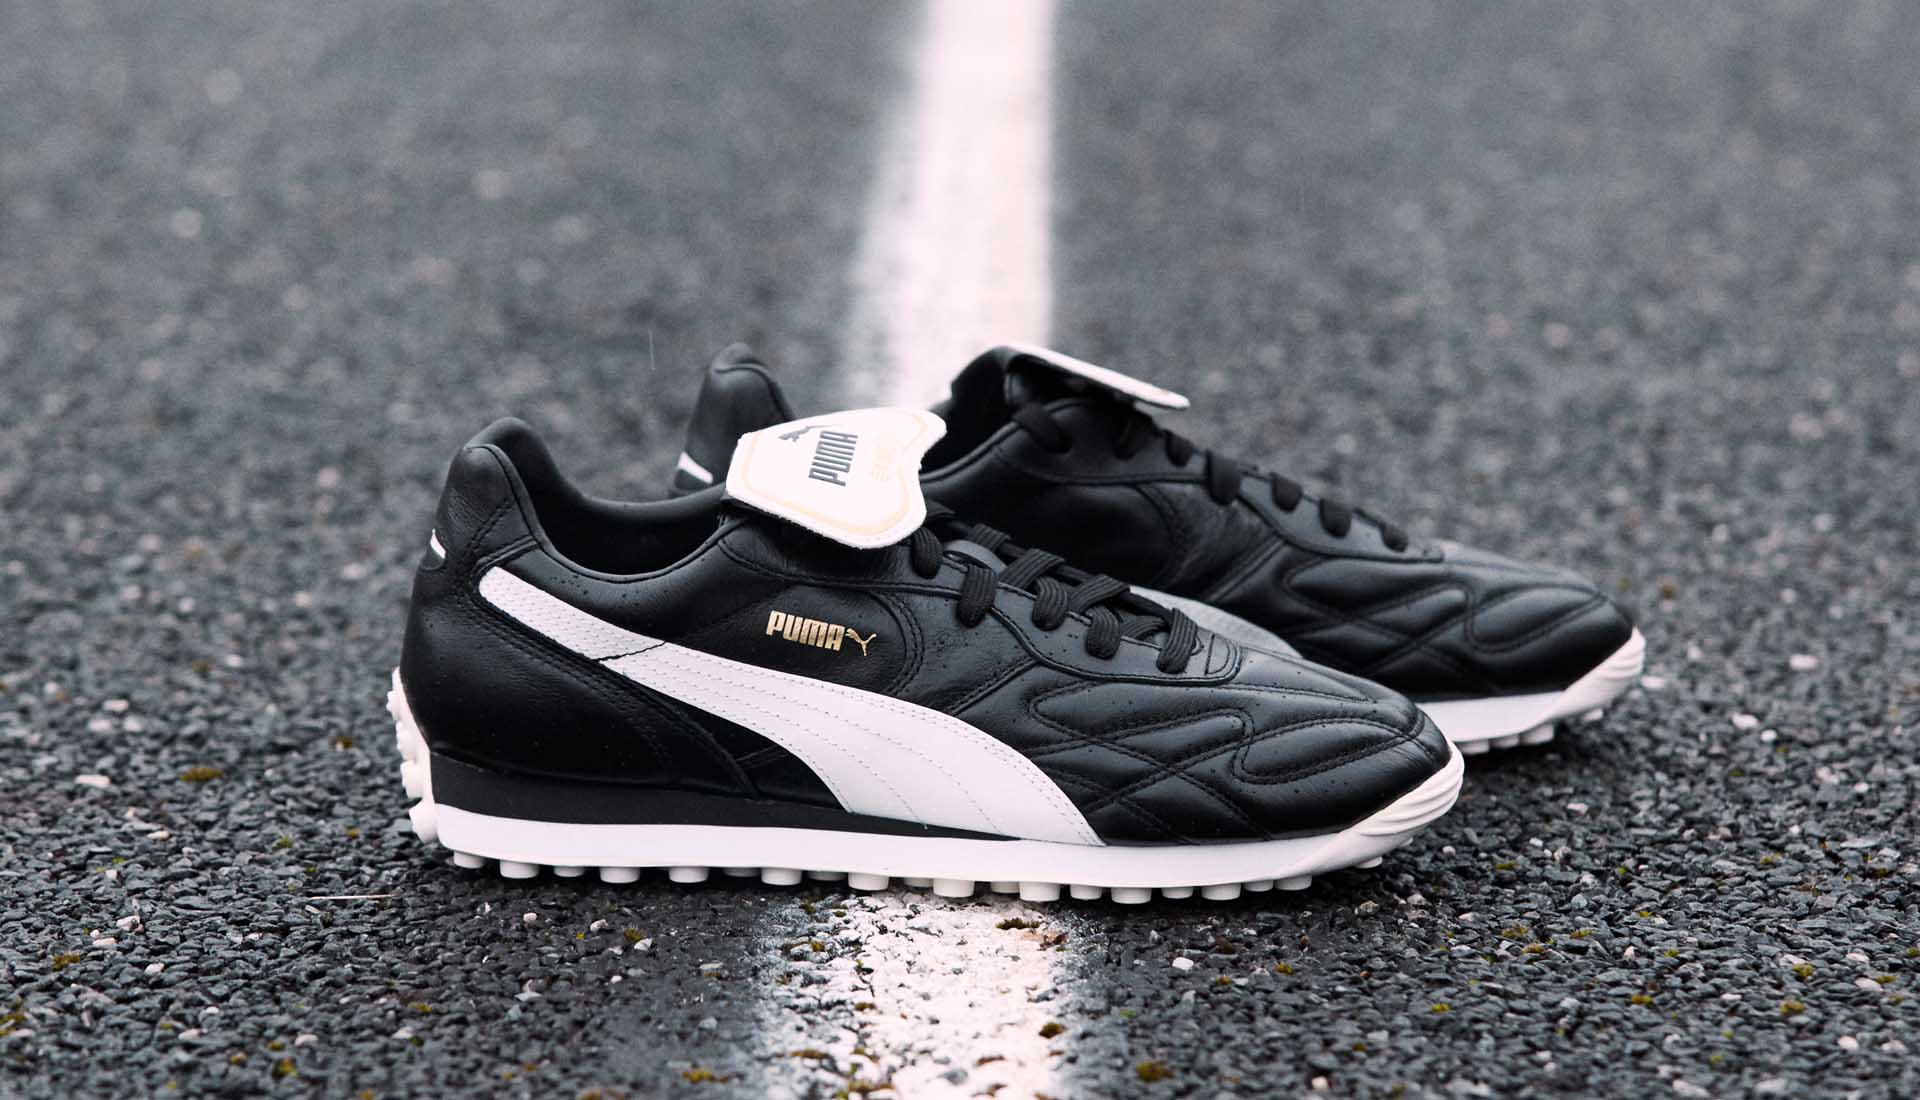 PUMA Launch The King Avanti Premium Sneakers - SoccerBible